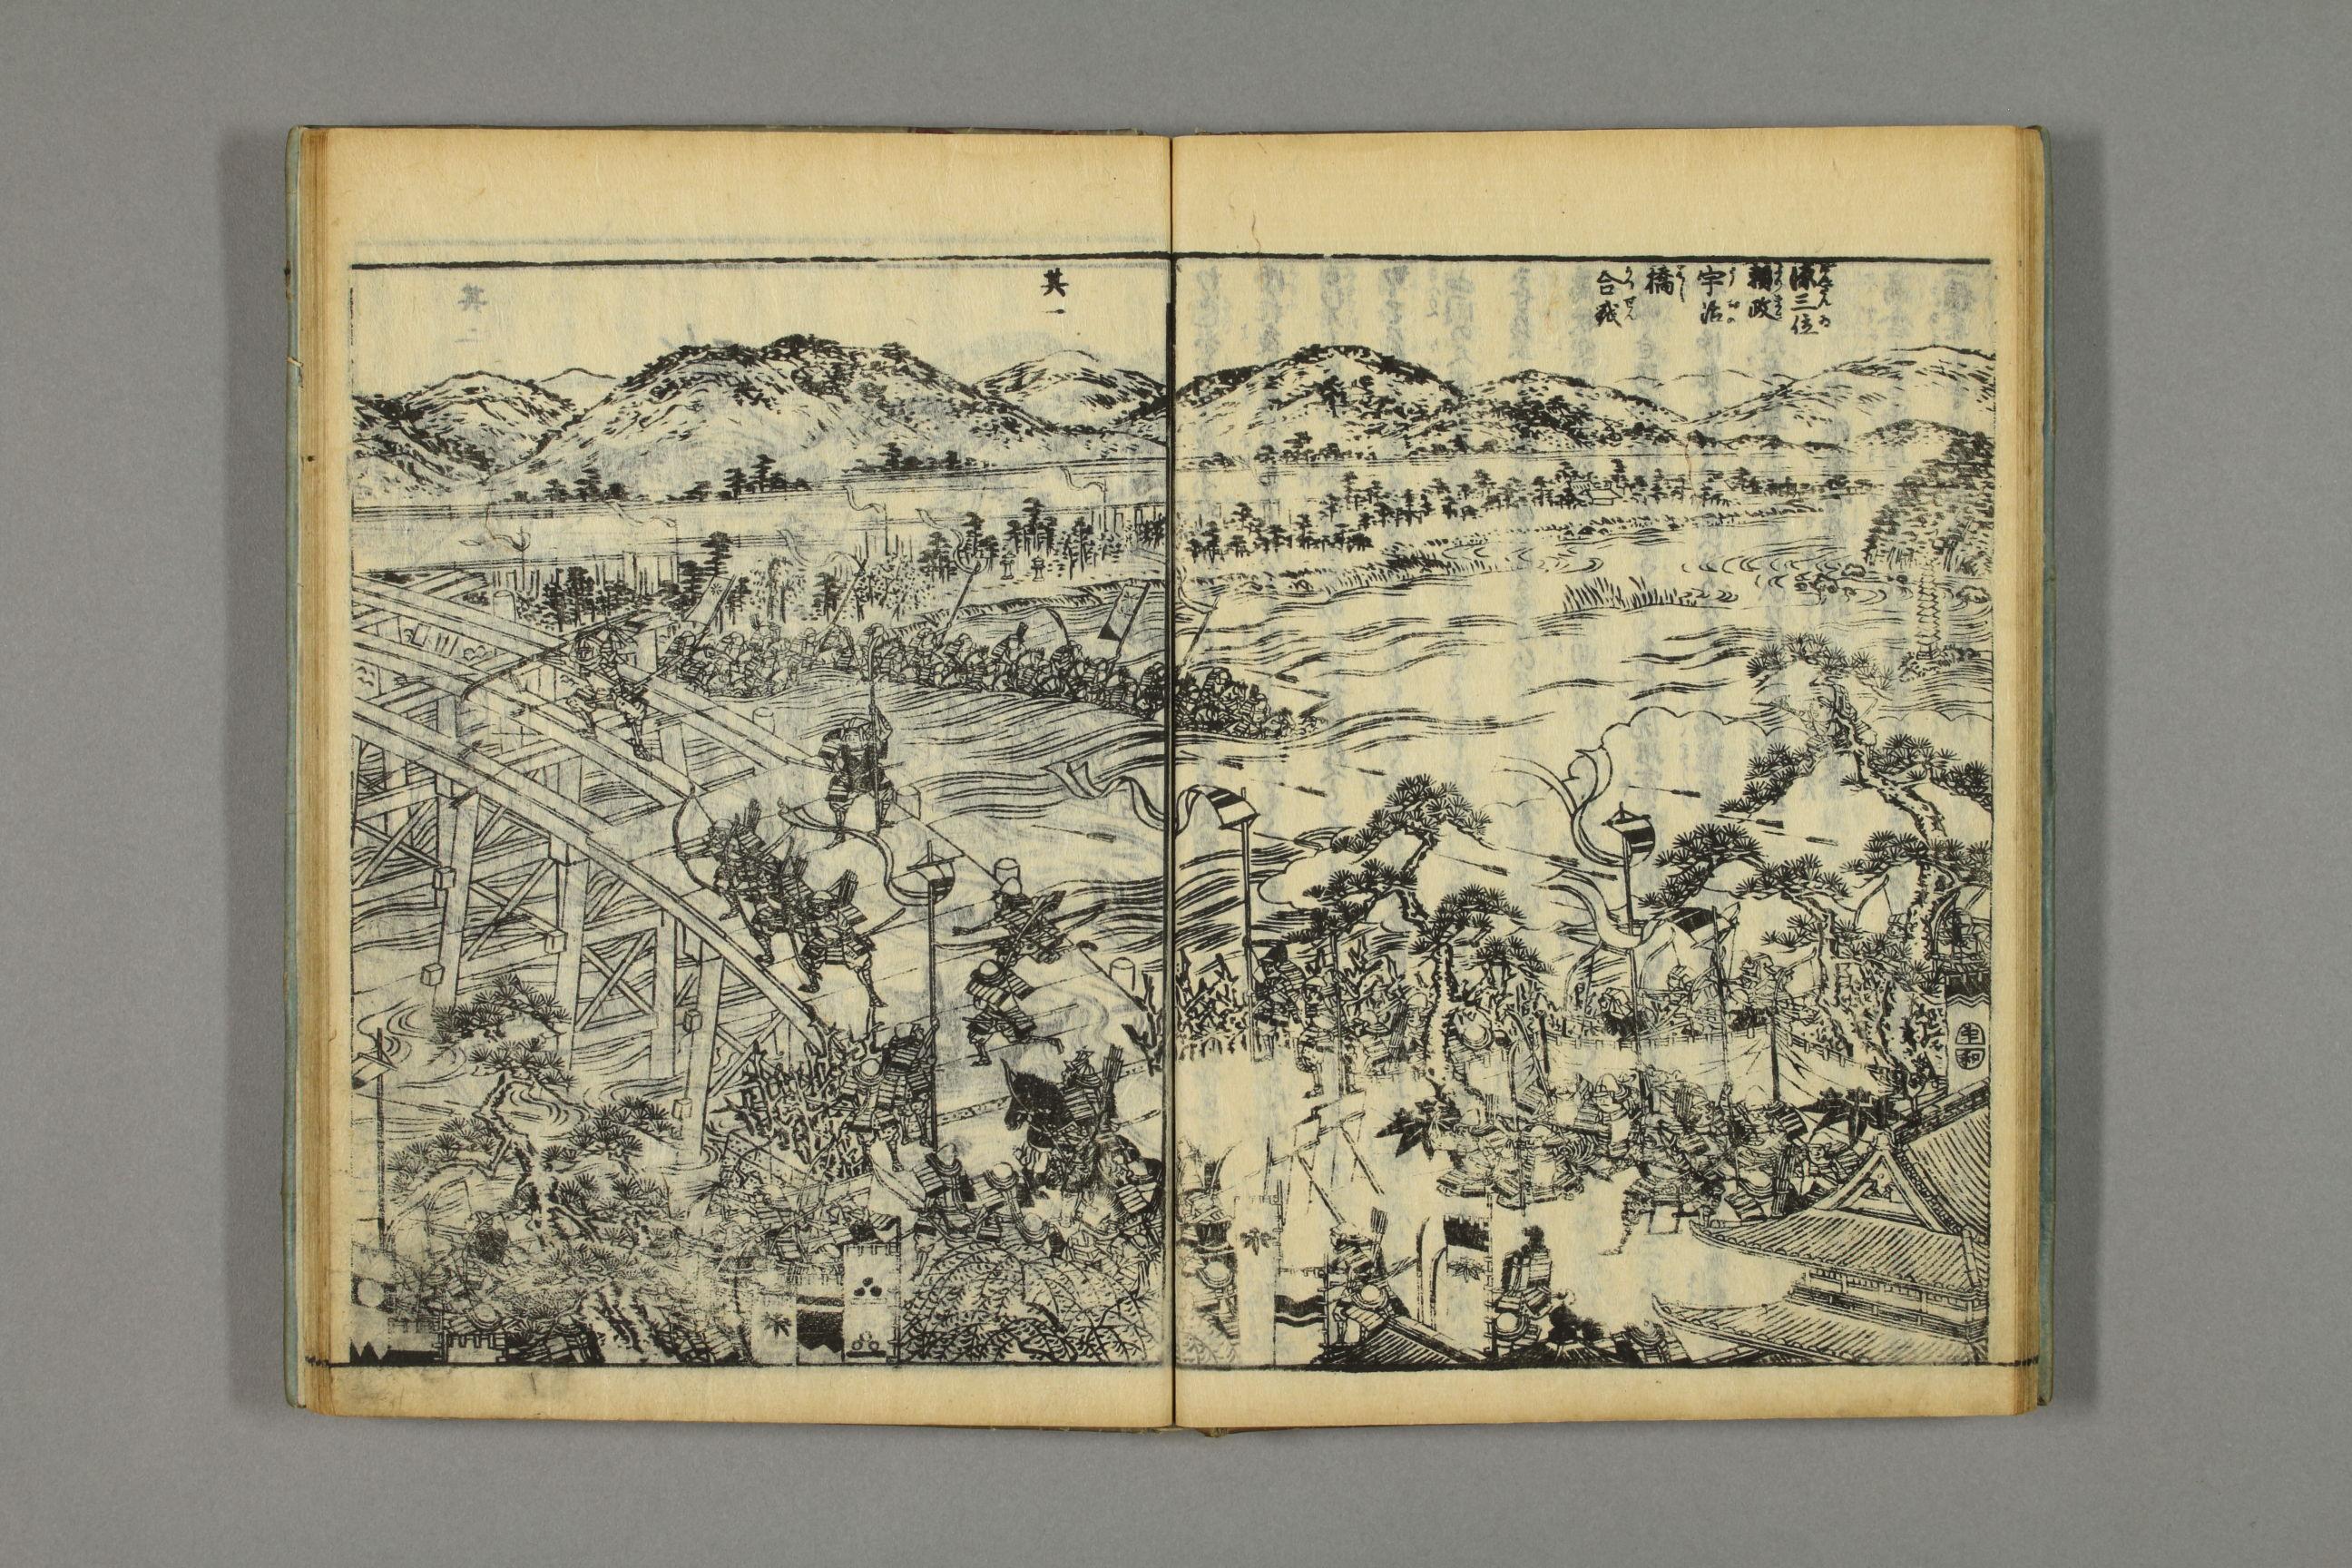 http://archive.wul.waseda.ac.jp/kosho/he13/he13_03309/he13_03309_0002/he13_03309_0002_p0025.jpg